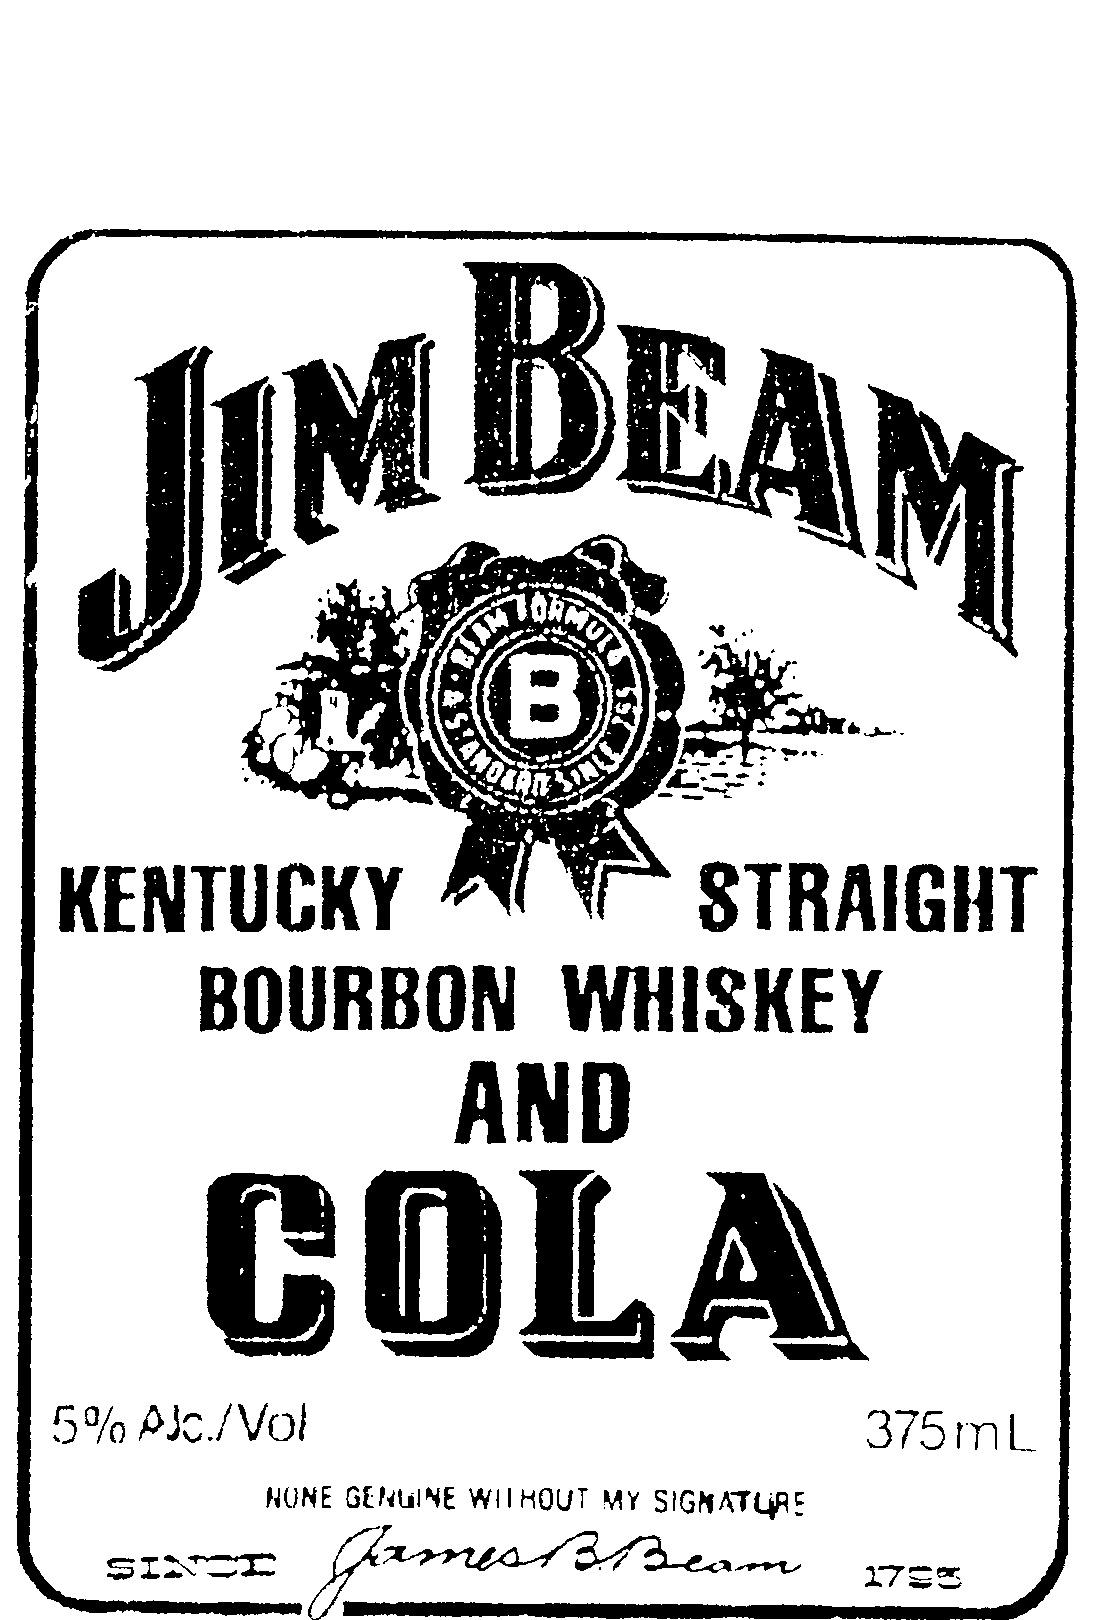 Jim Beam Kentucky Straight Bourbon Whiskey And Cola B By